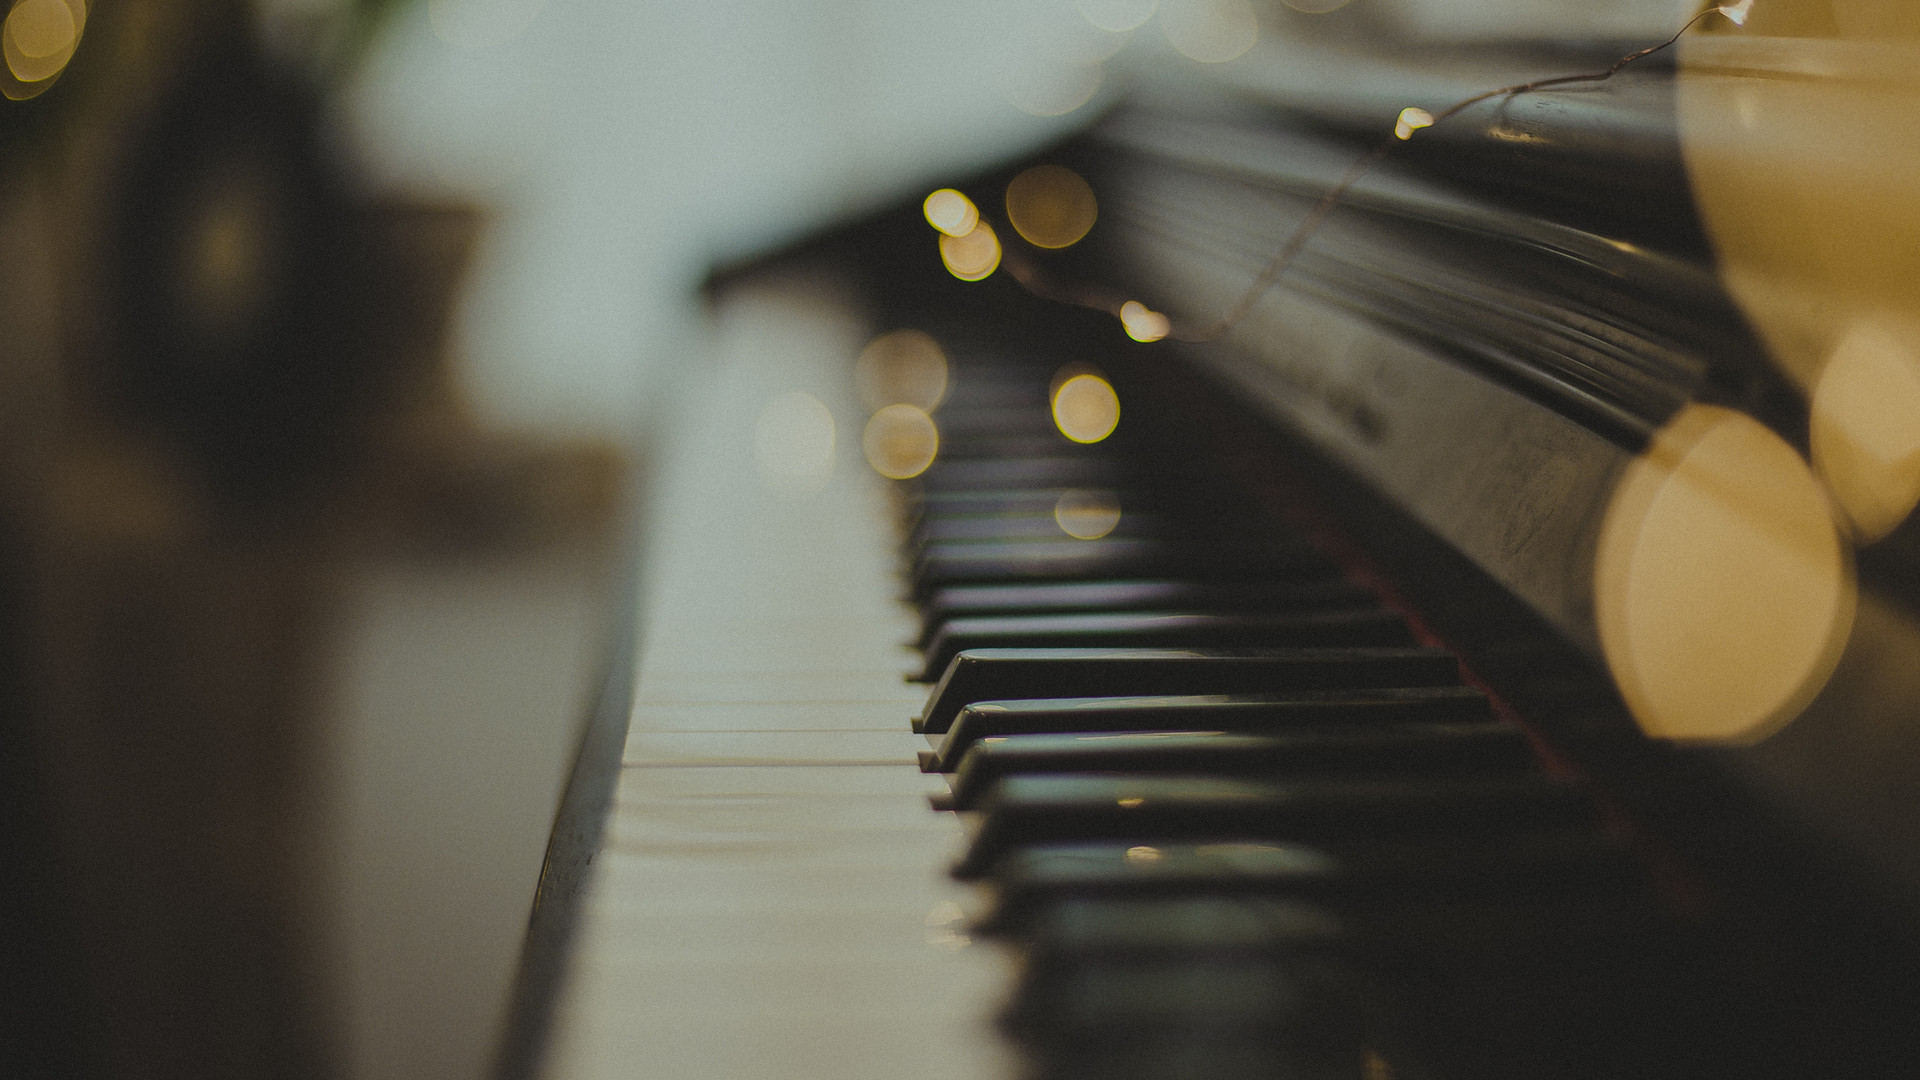 88 piano keys by Ebuen Clemente Jr